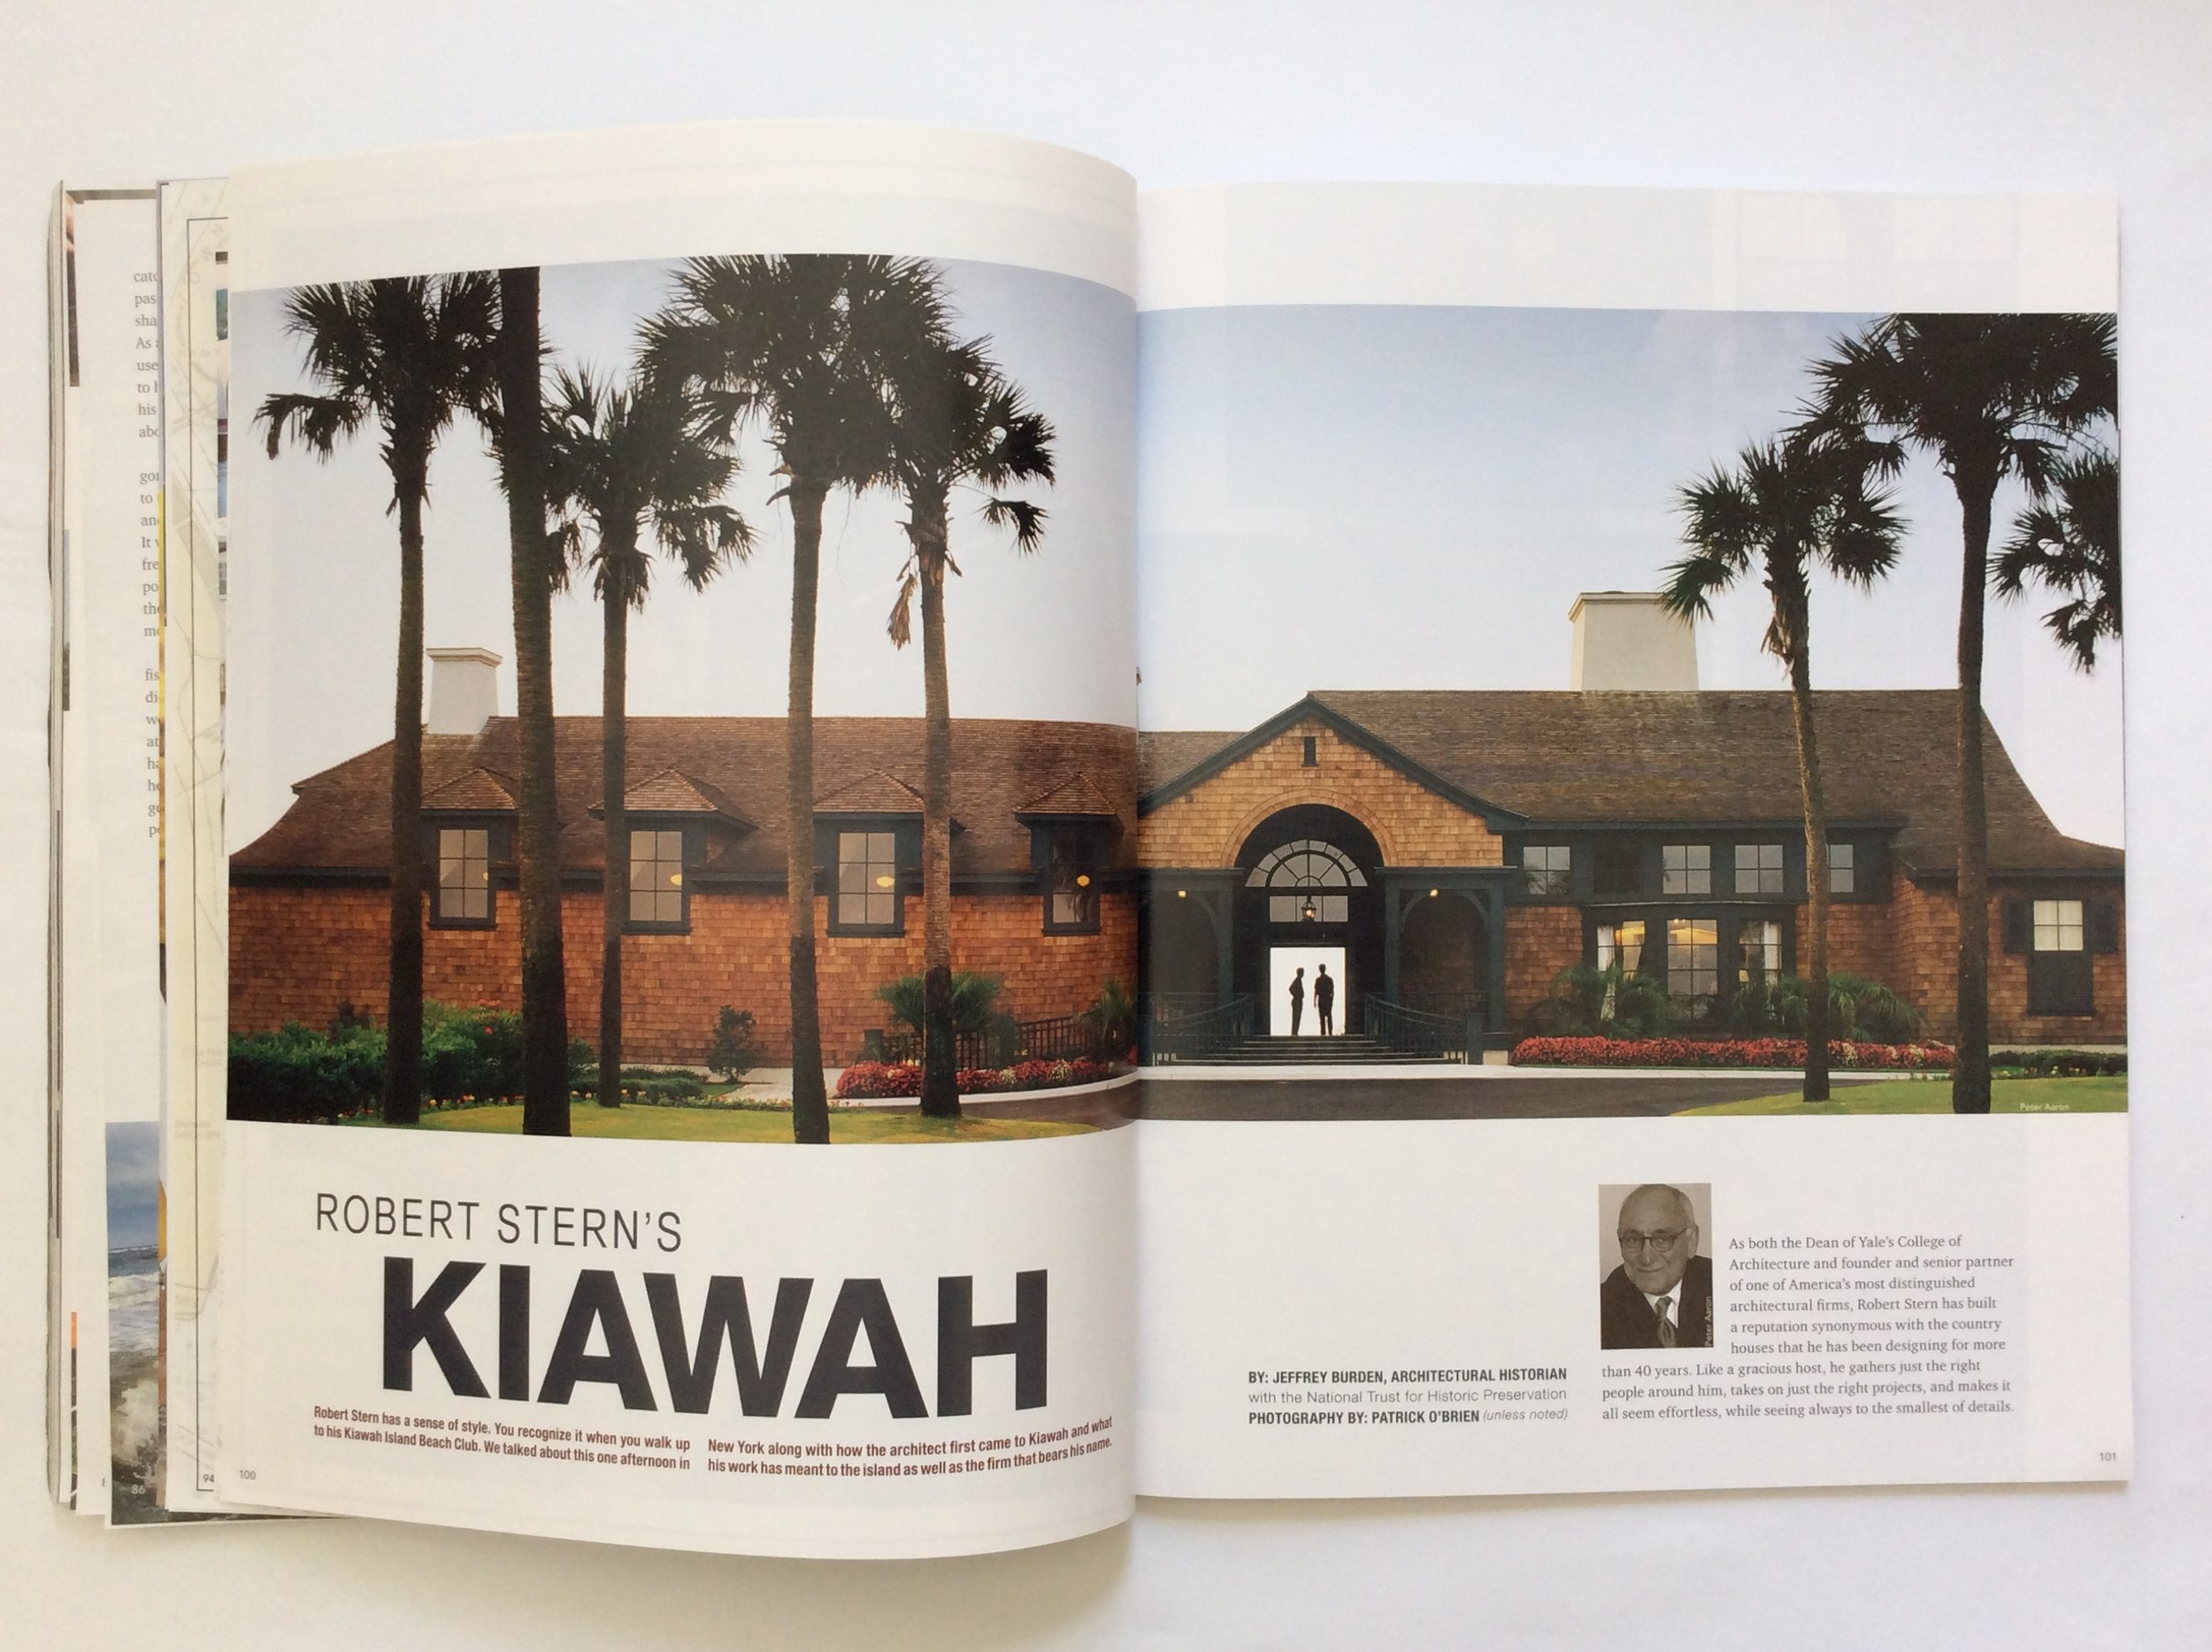 Robert Stern's Kiawah